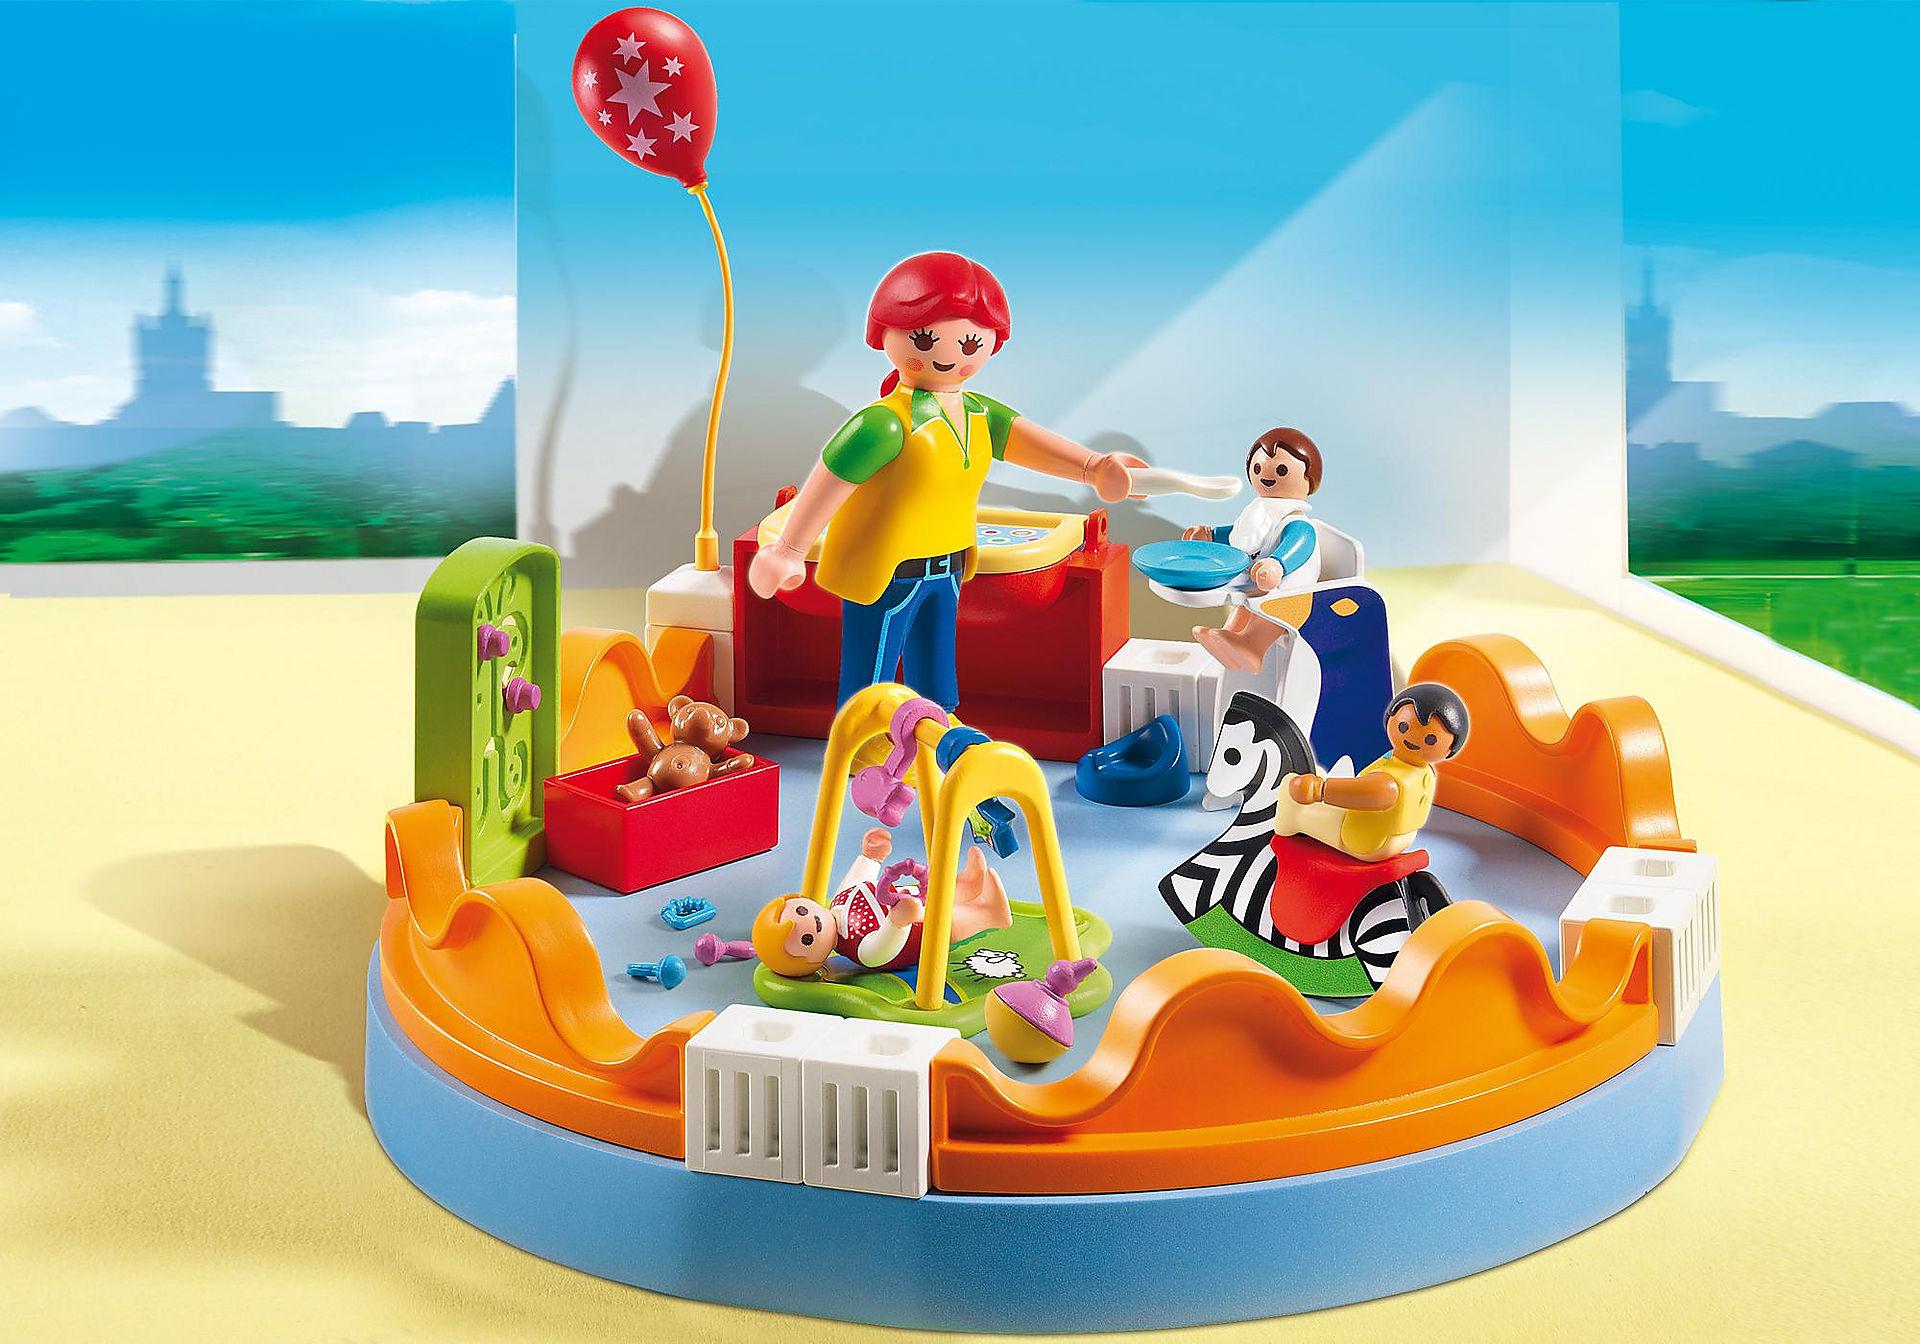 http://media.playmobil.com/i/playmobil/5570_product_detail/Espace crèche avec bébés